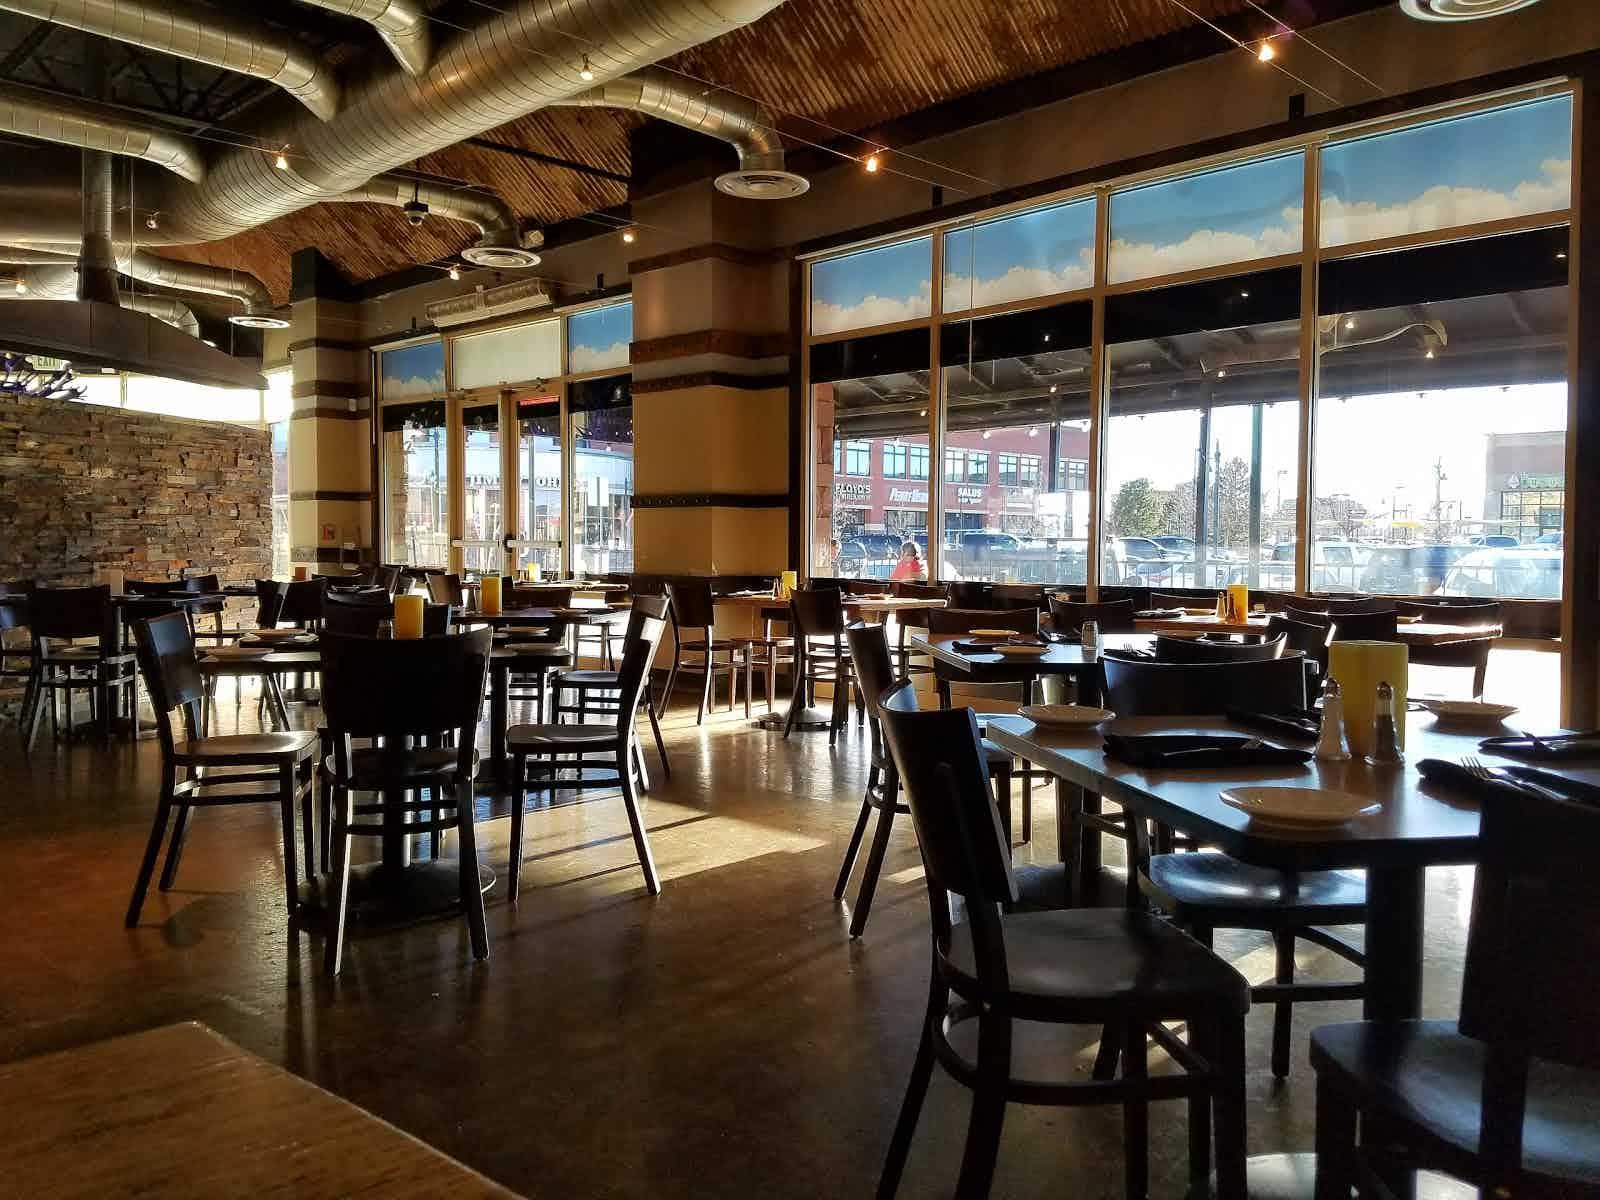 Old Blinking Light   Highlands Ranch | Restaurant Review   Zagat